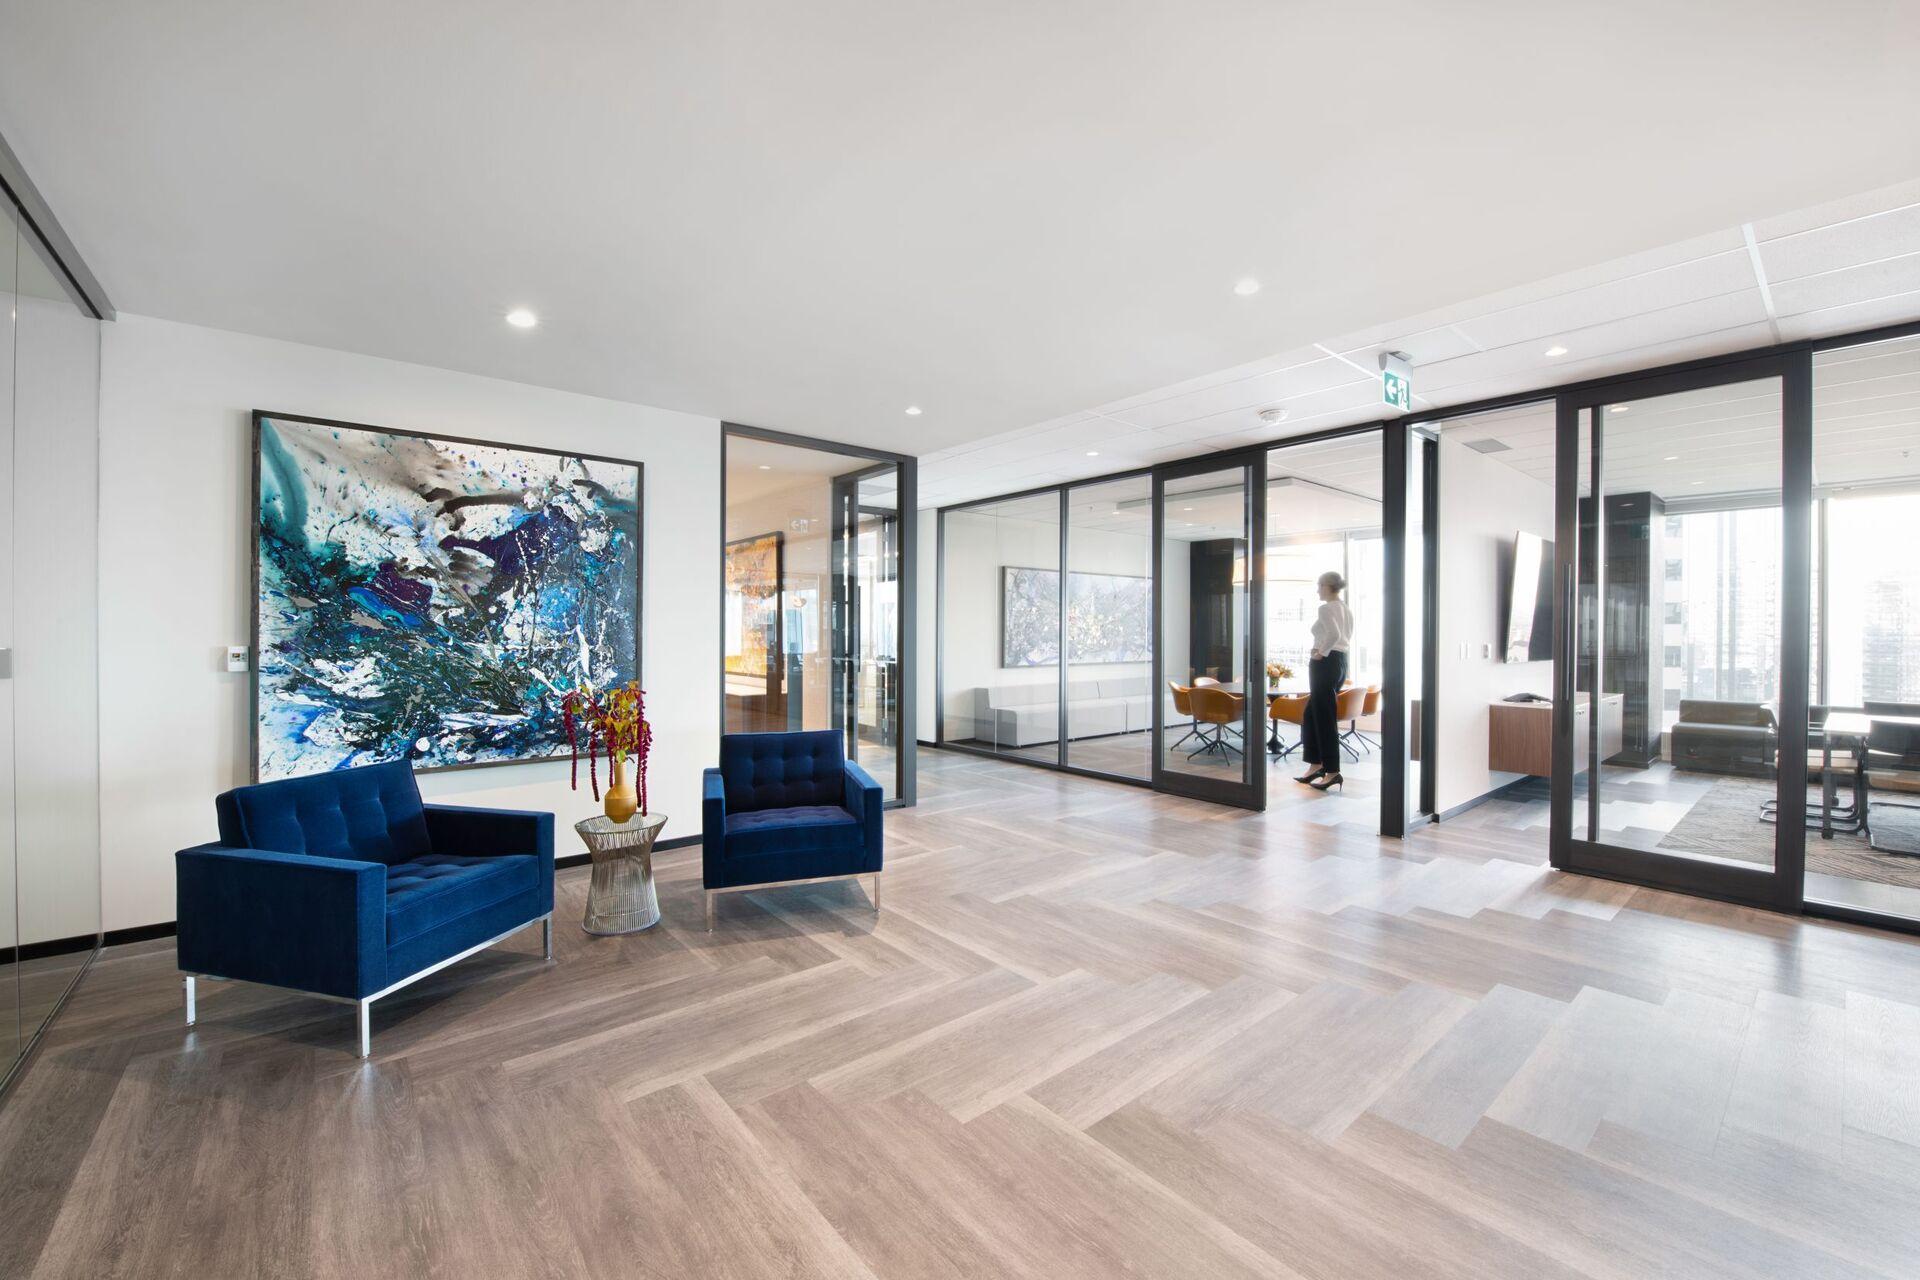 Avison Young photo showing an open space built using DIRTT custom modular interior solutions